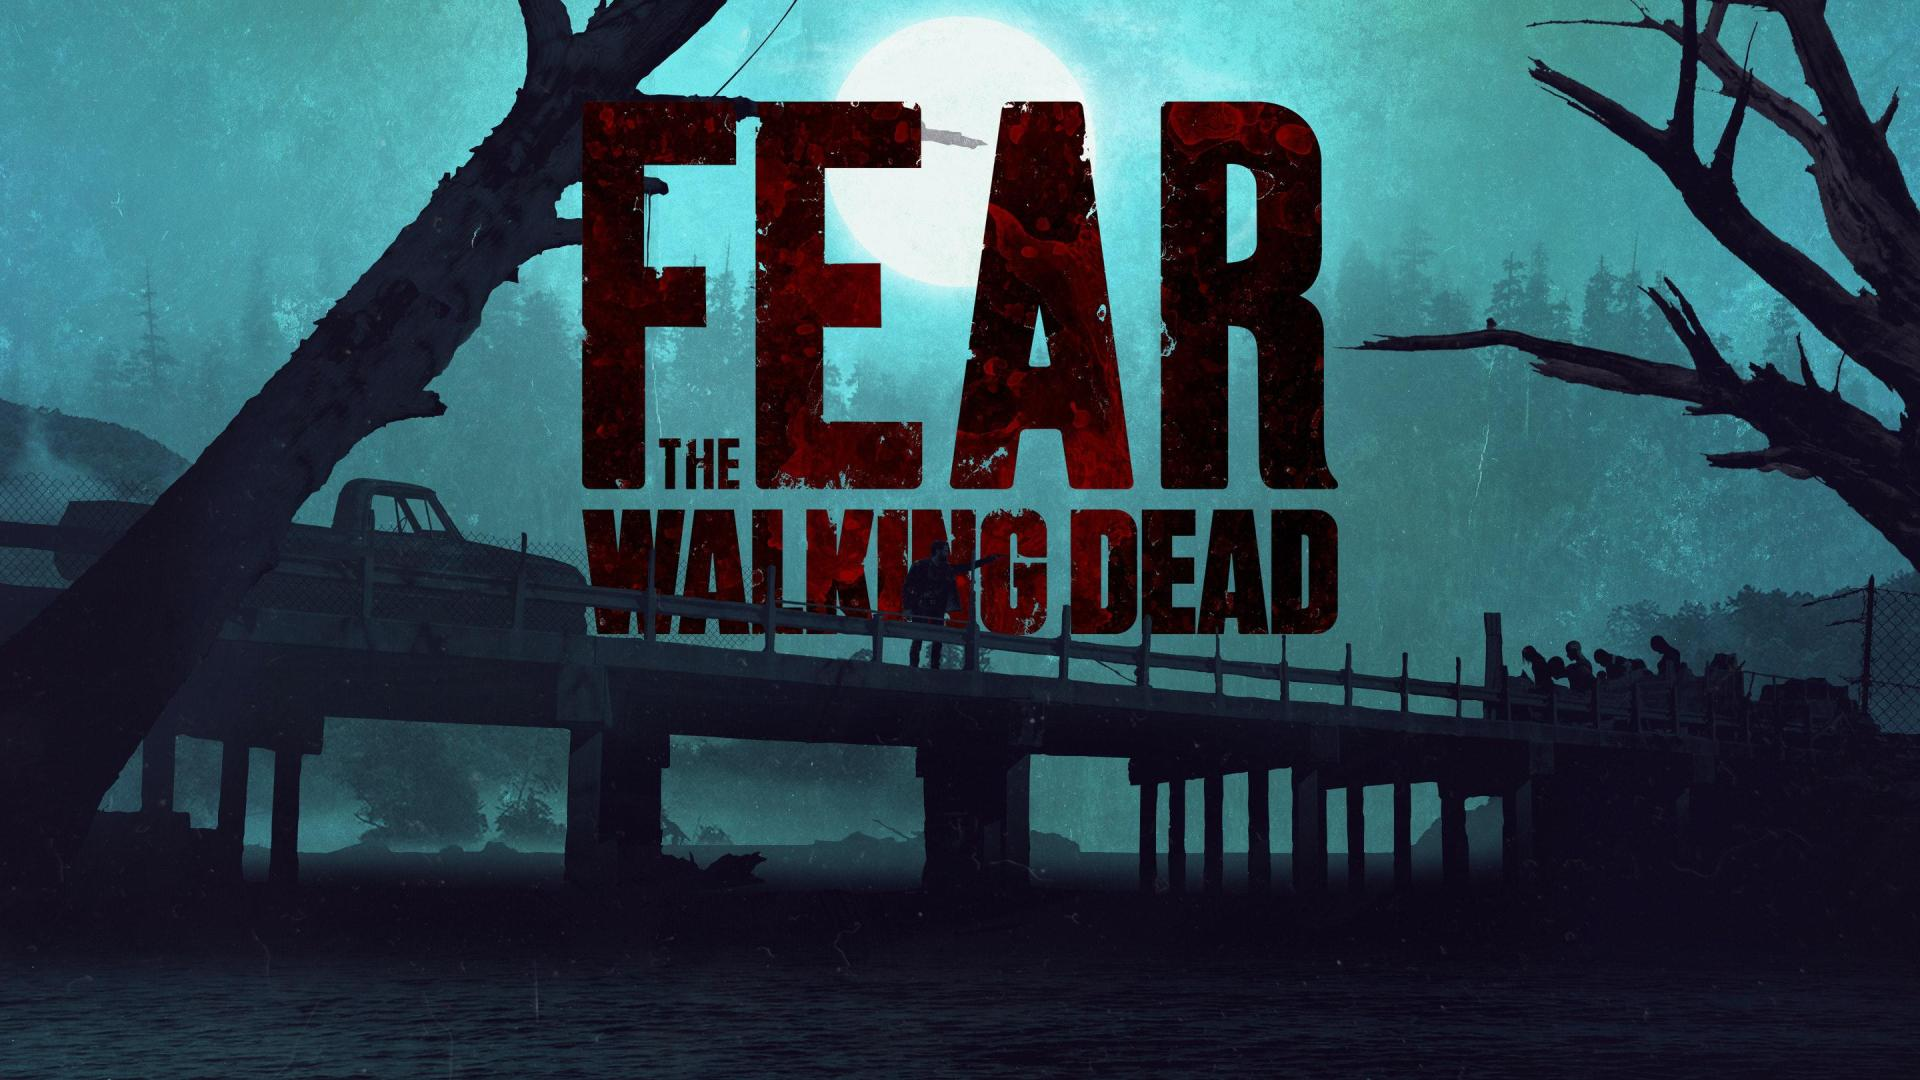 Fear The Walking Dead 6x08: The Door